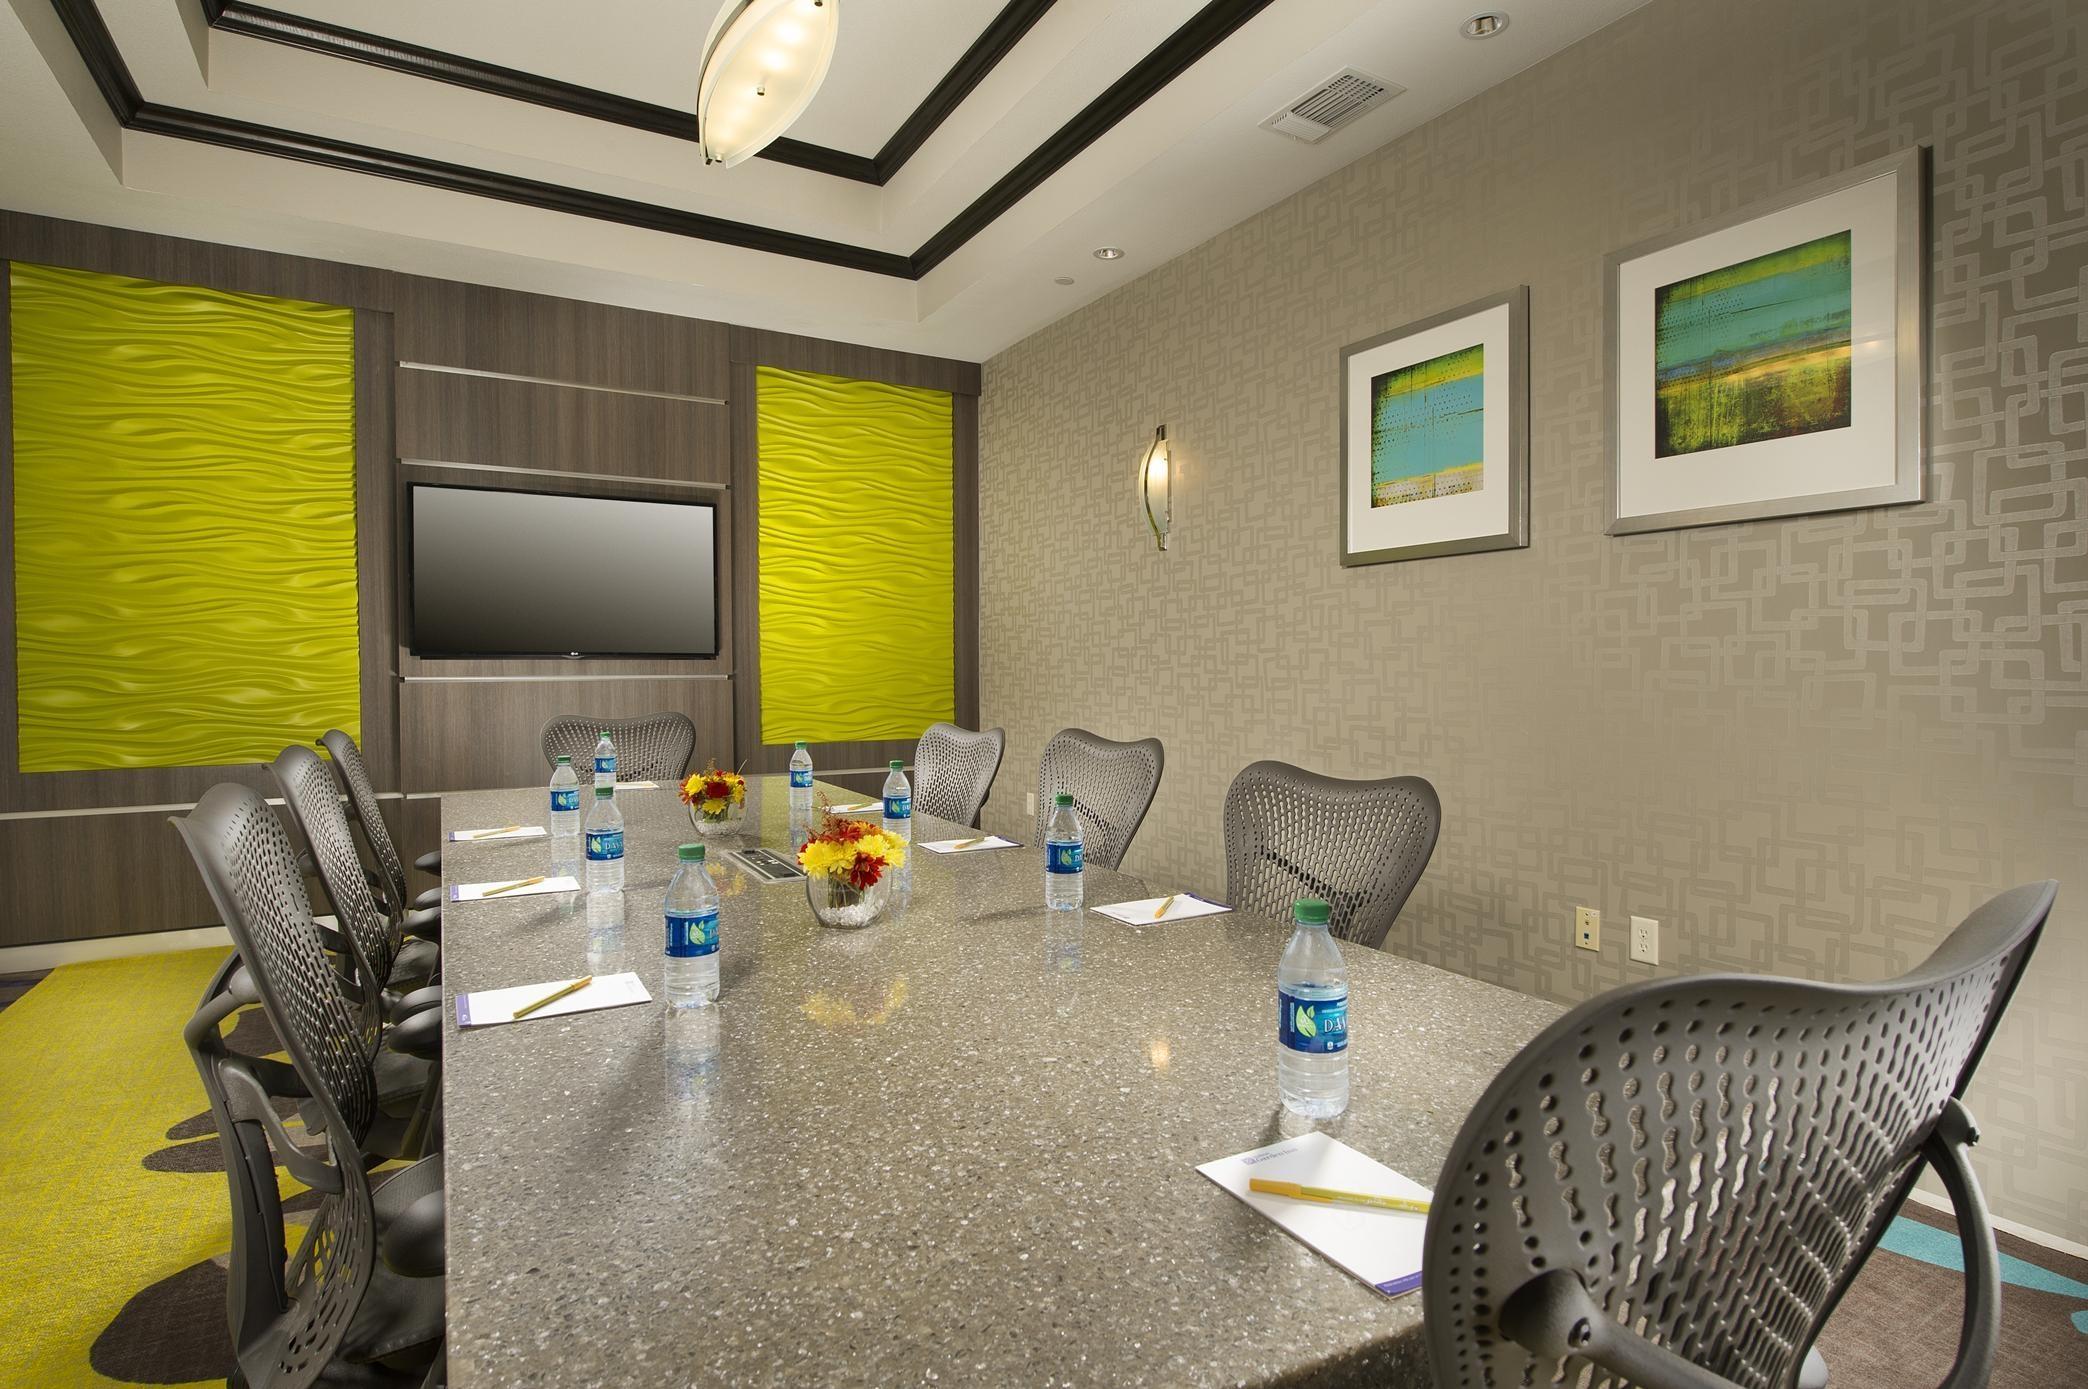 Hilton Garden Inn College Station image 11